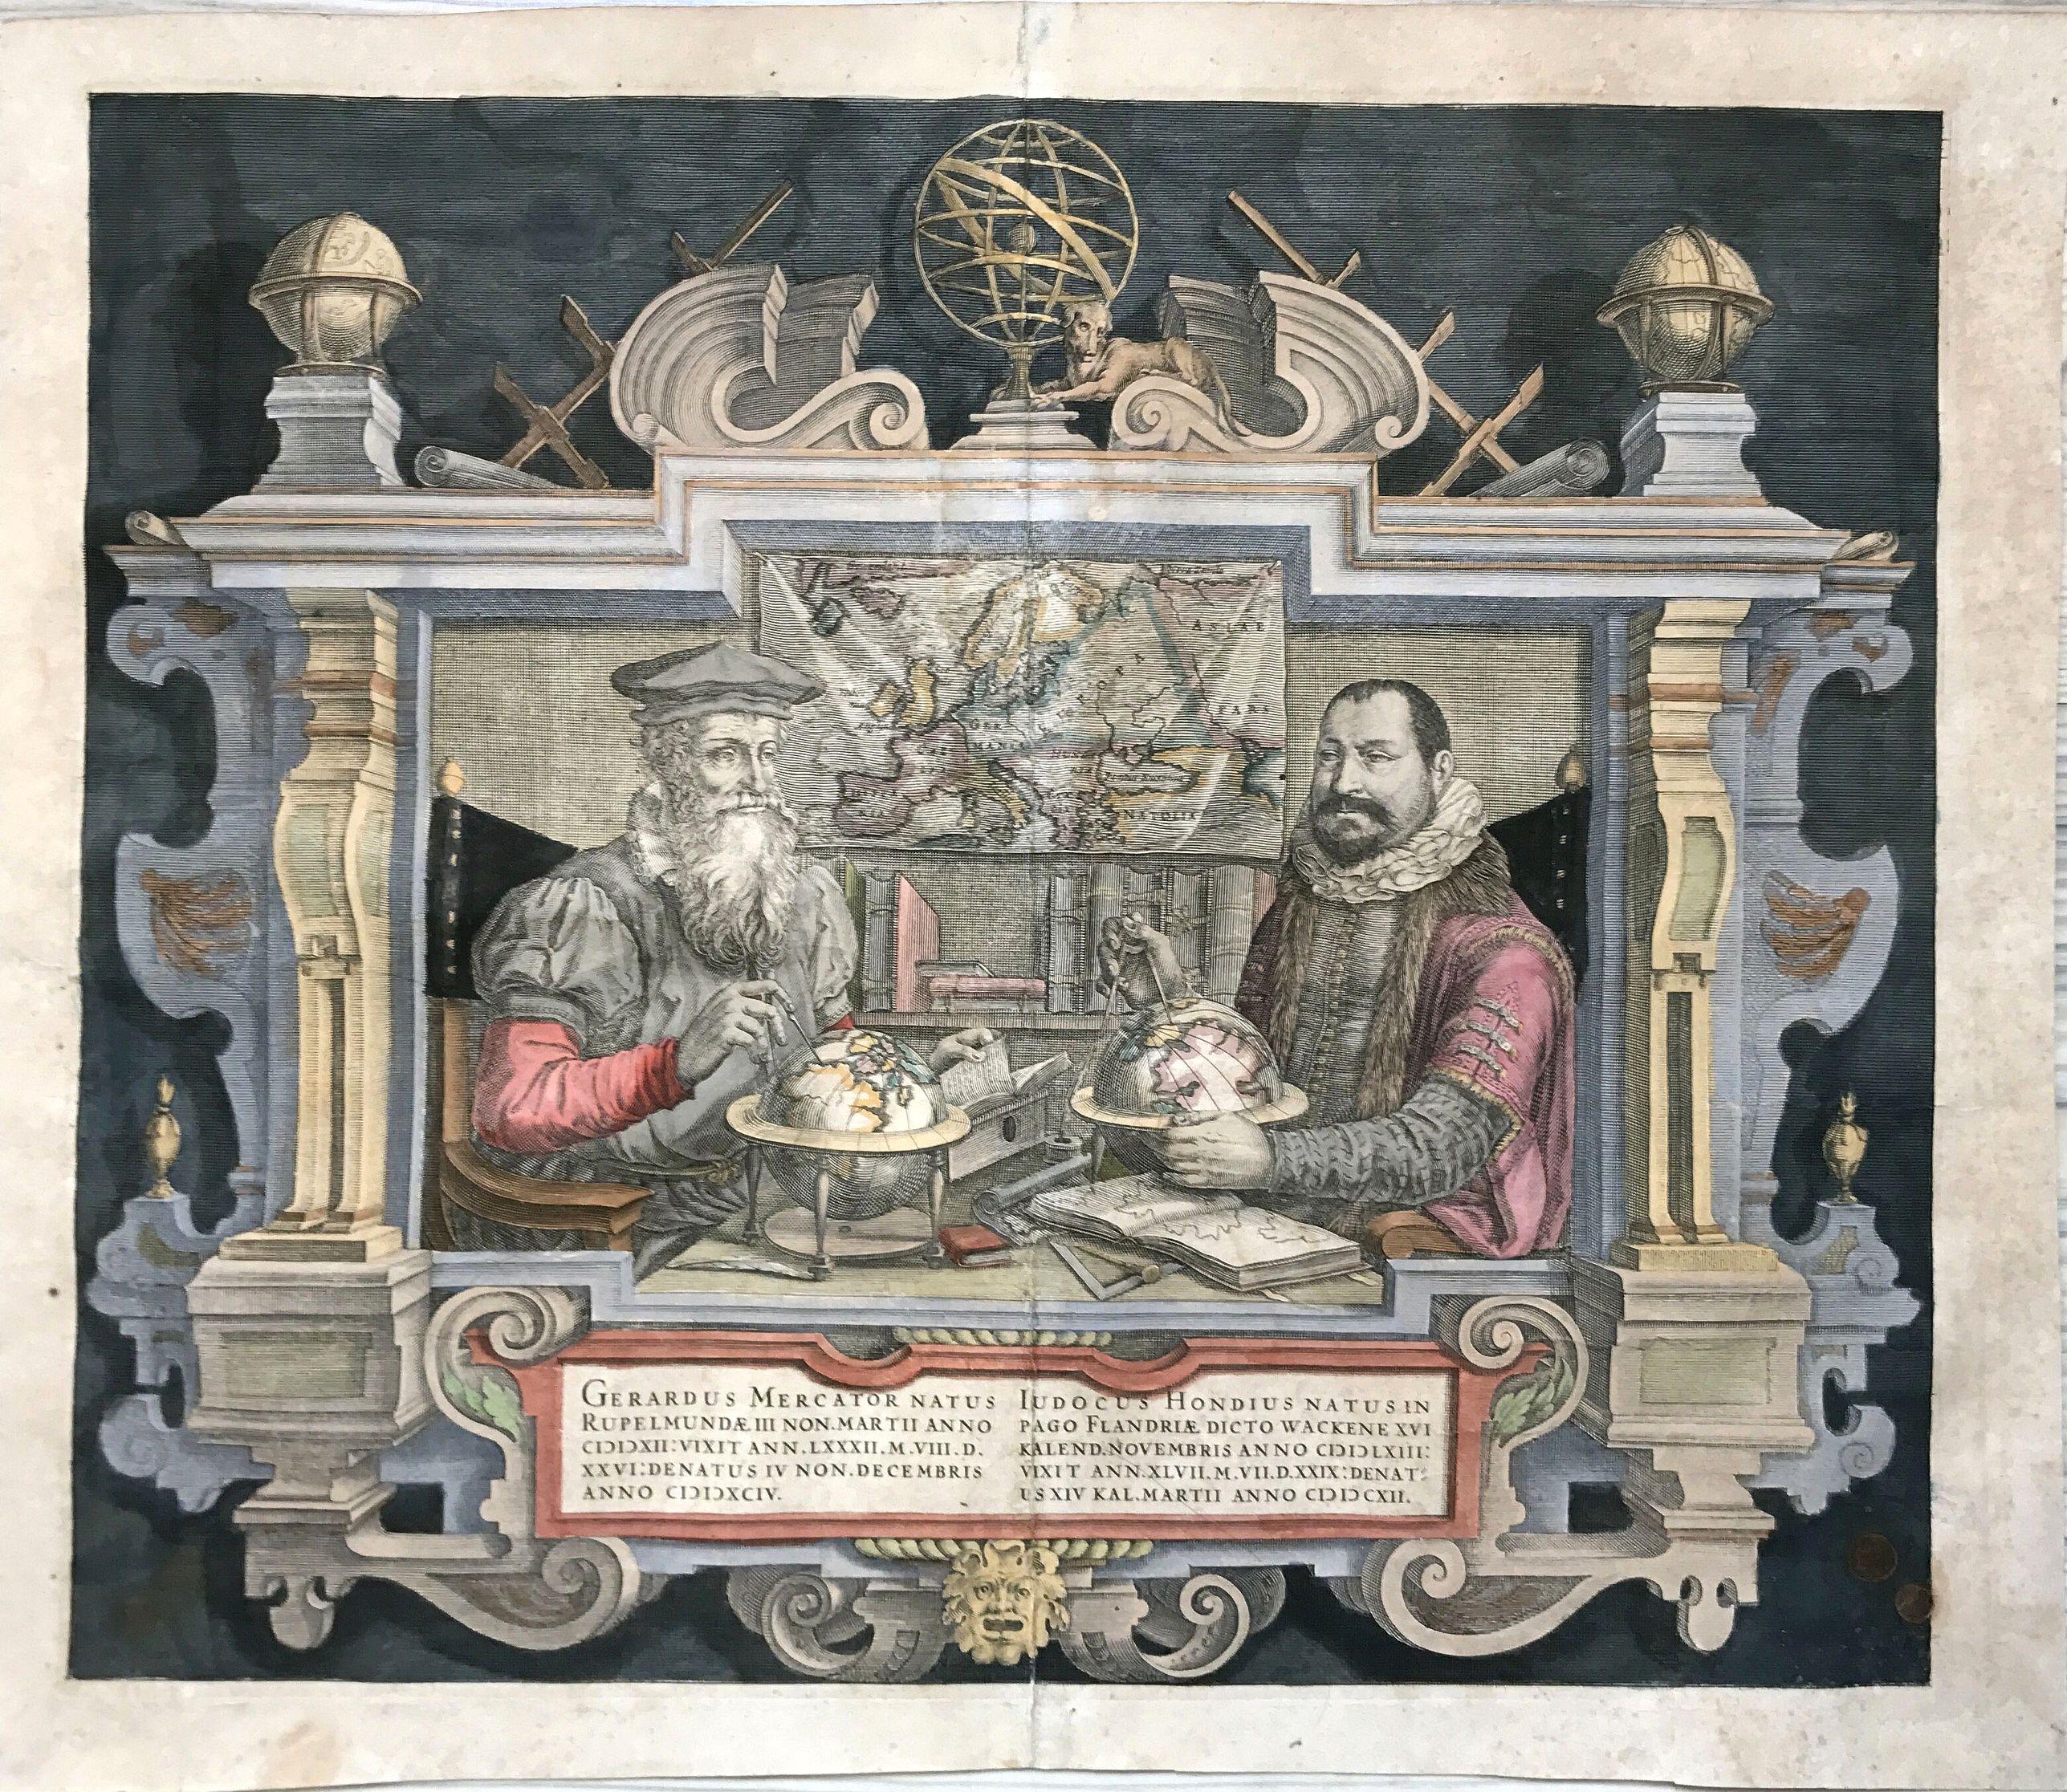 MERCATOR, G./ HONDIUS, J. - [Title page] Gerardus Mercator natus Iudocus Hondius. . .